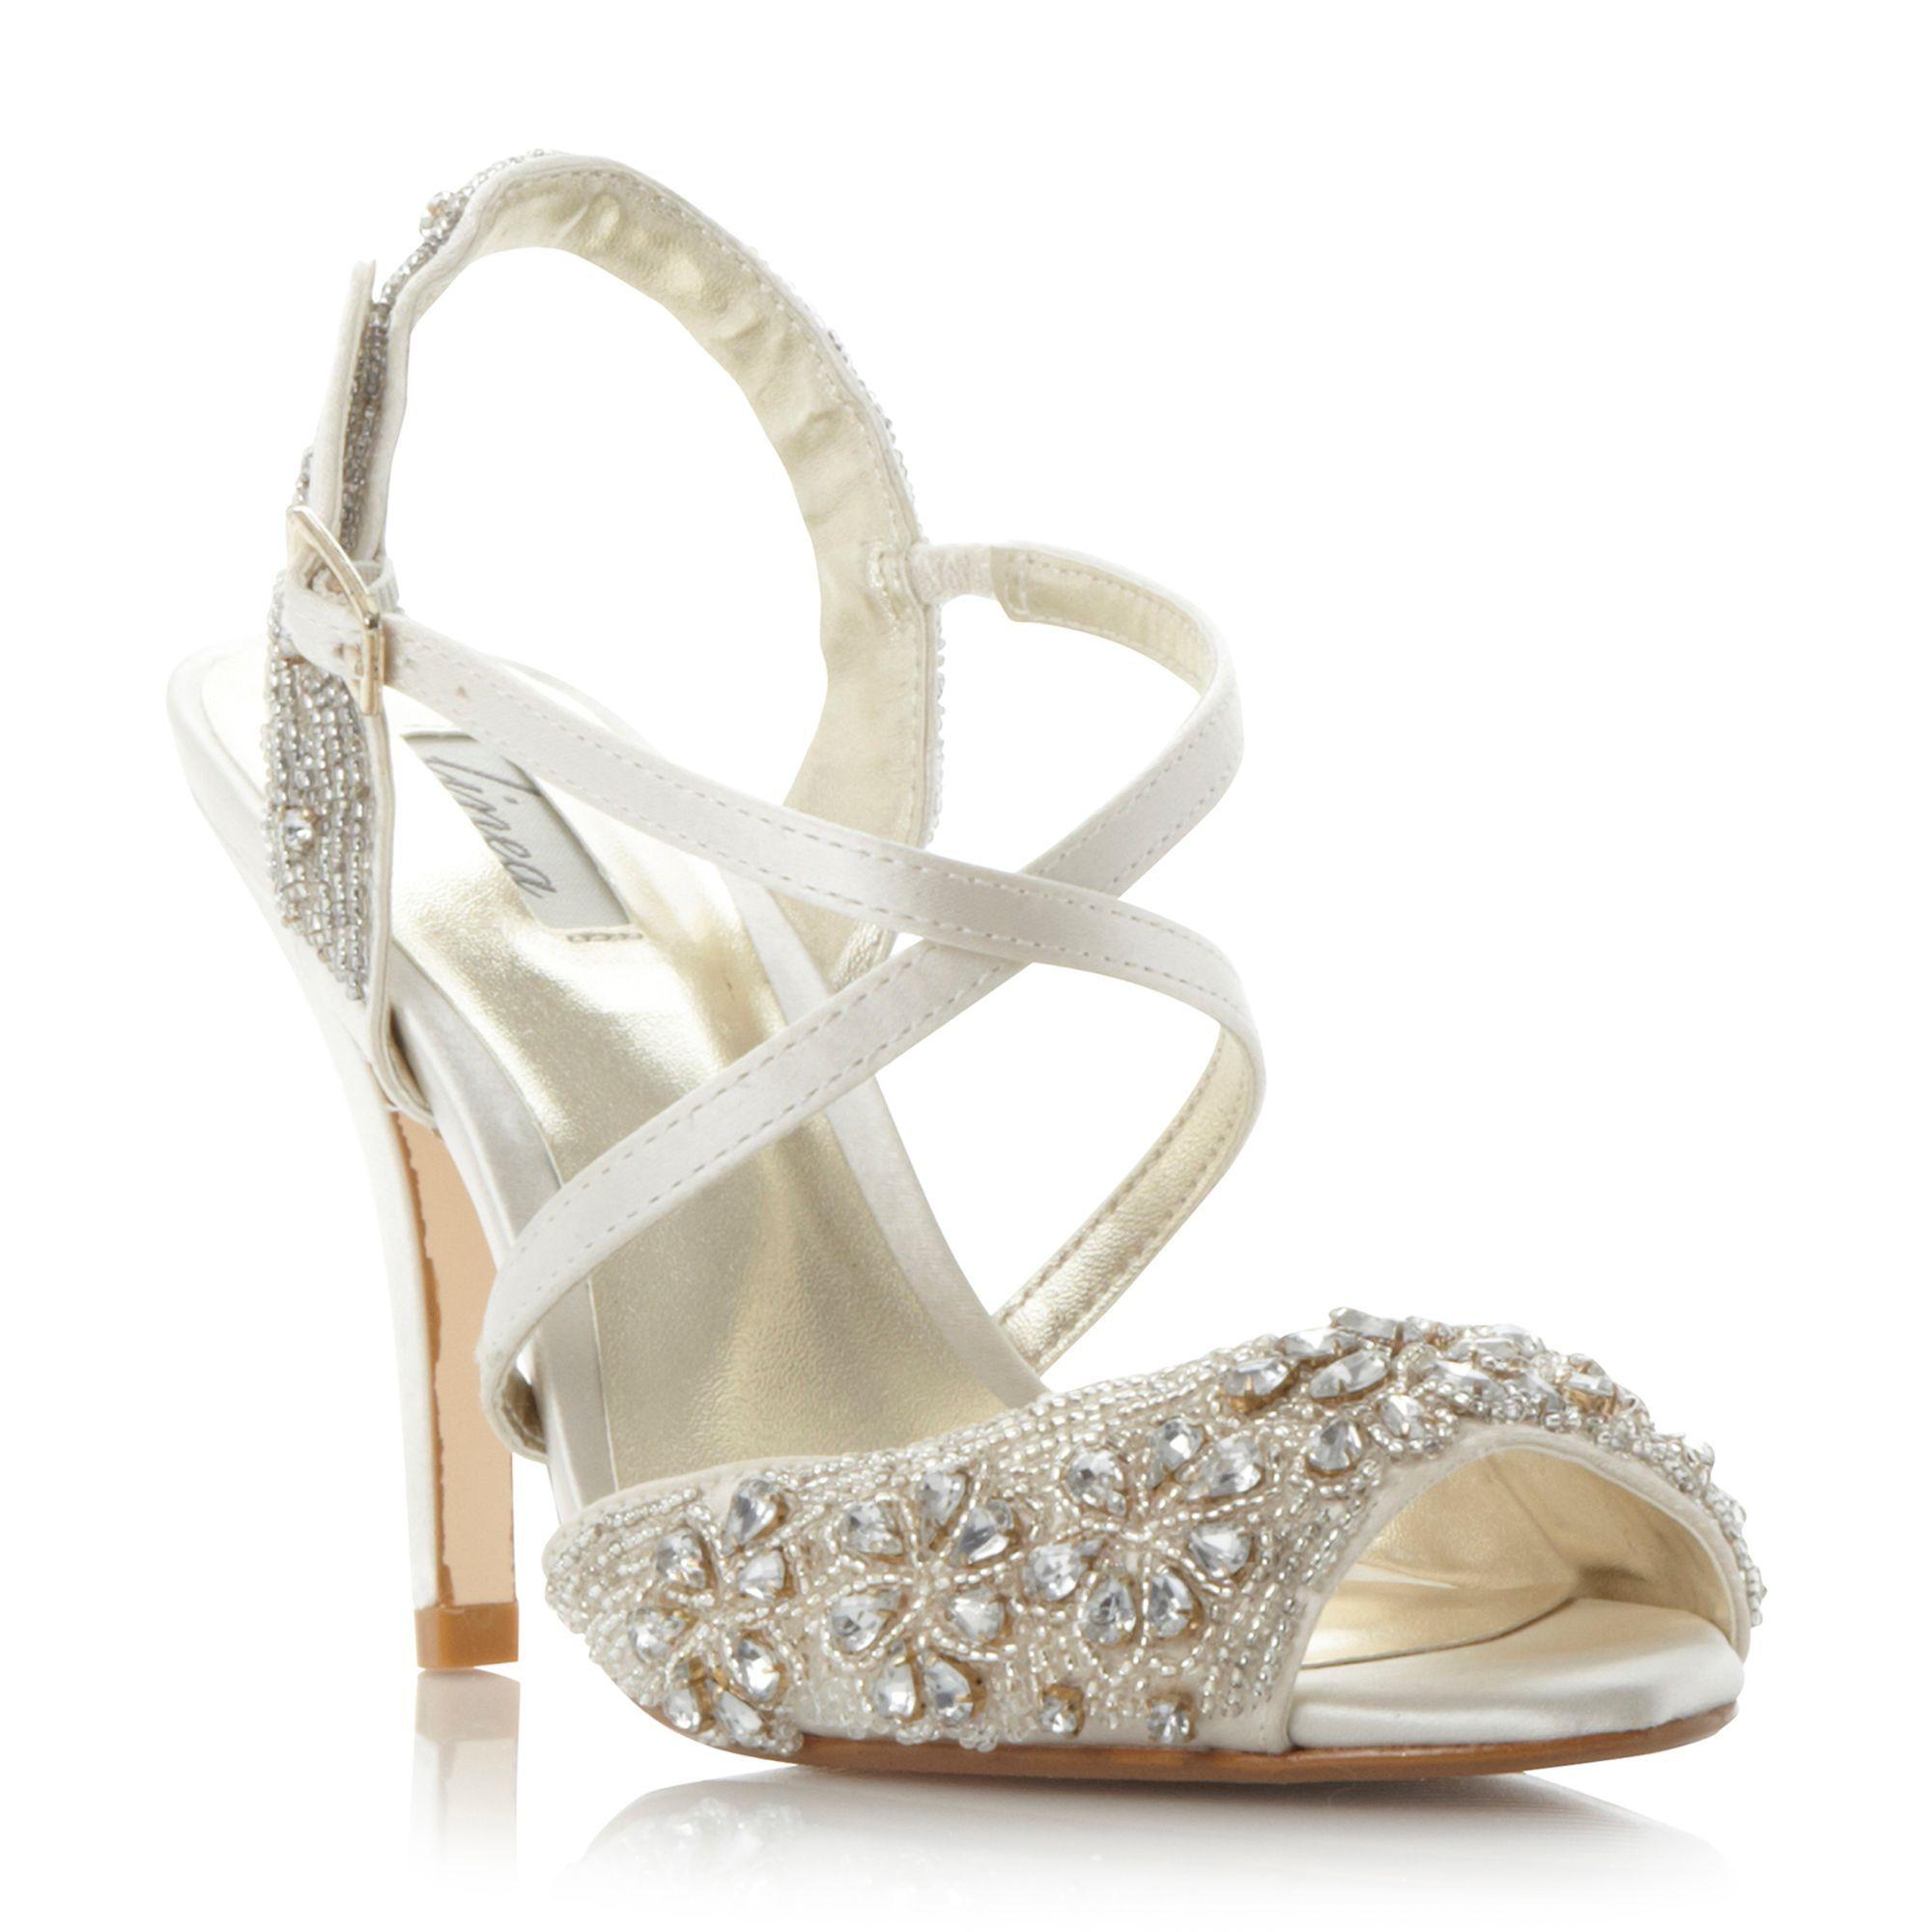 Linea Molana embellished cross strap high heel sandals, Ivory